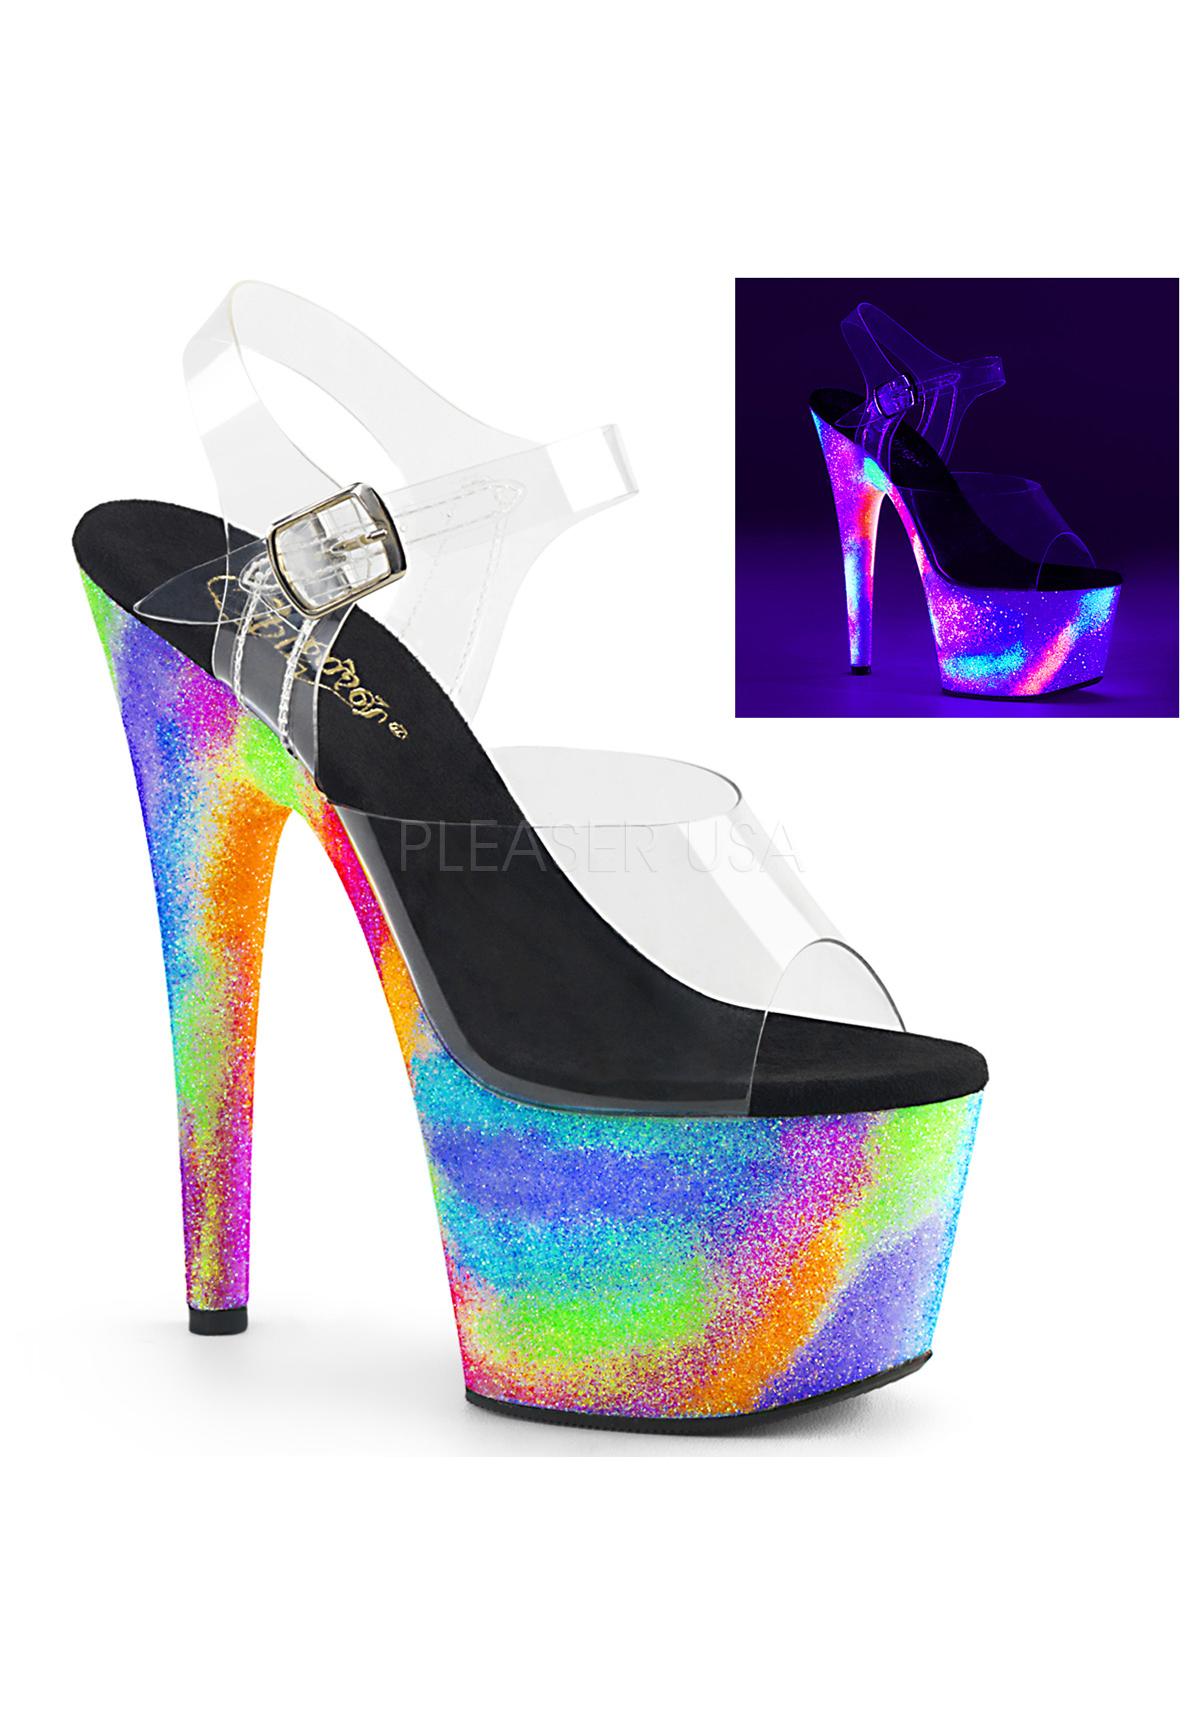 Pleaser 7  Heel, 2 3 4  Platform Ankle Strap Sandal With UV Galaxy Effect